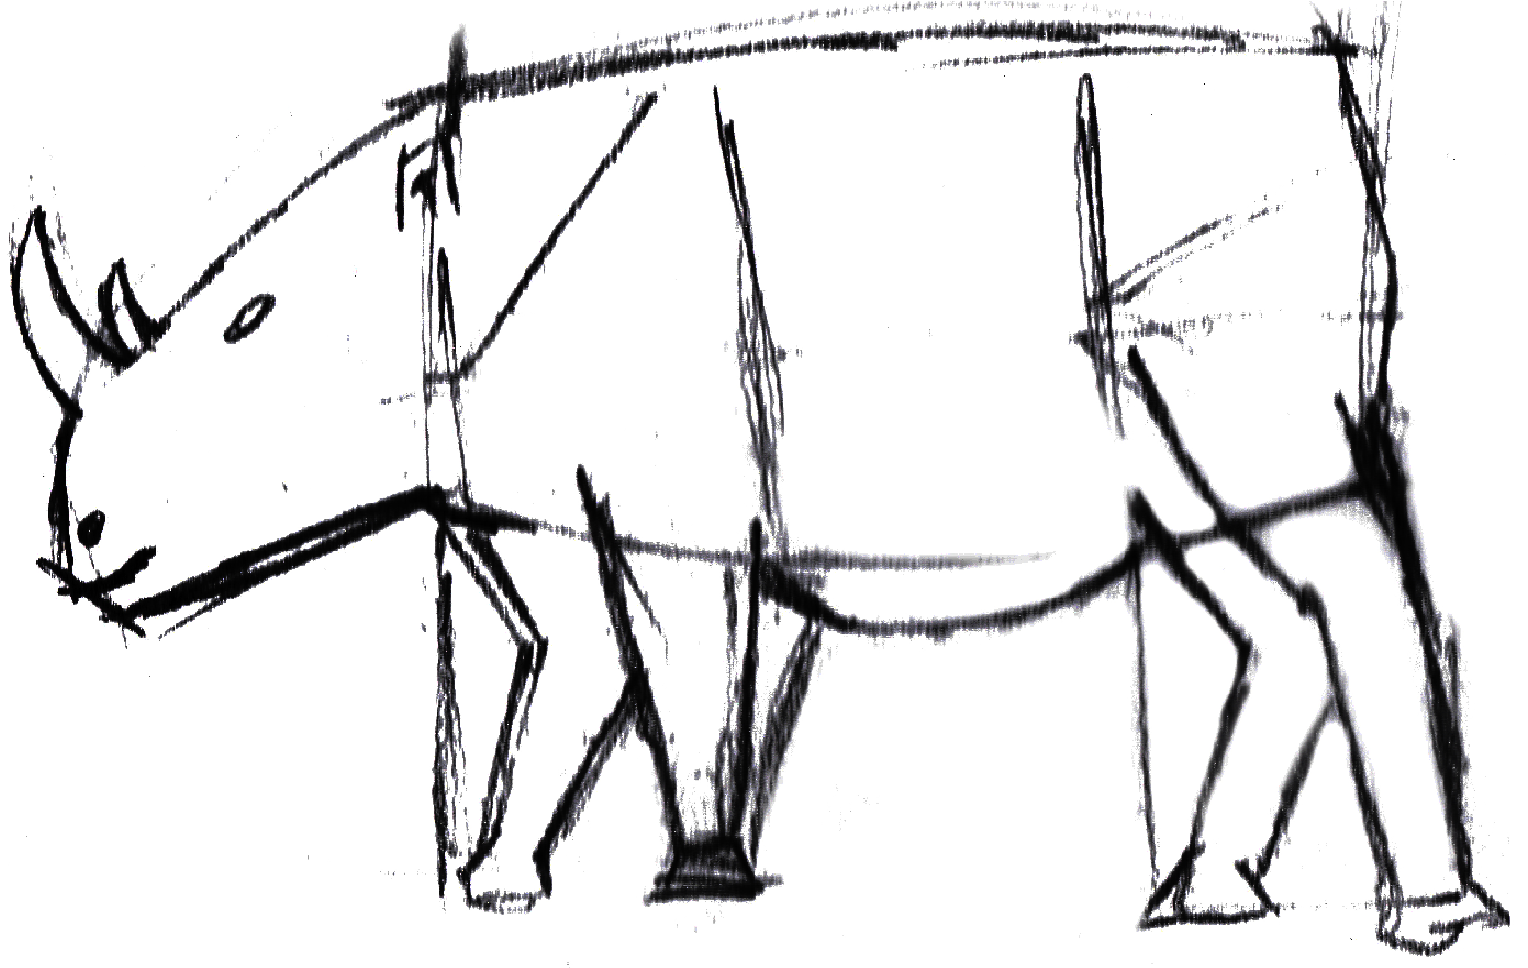 1528x968 Drawing For Animation Bhawtin University Blog And Portfolio